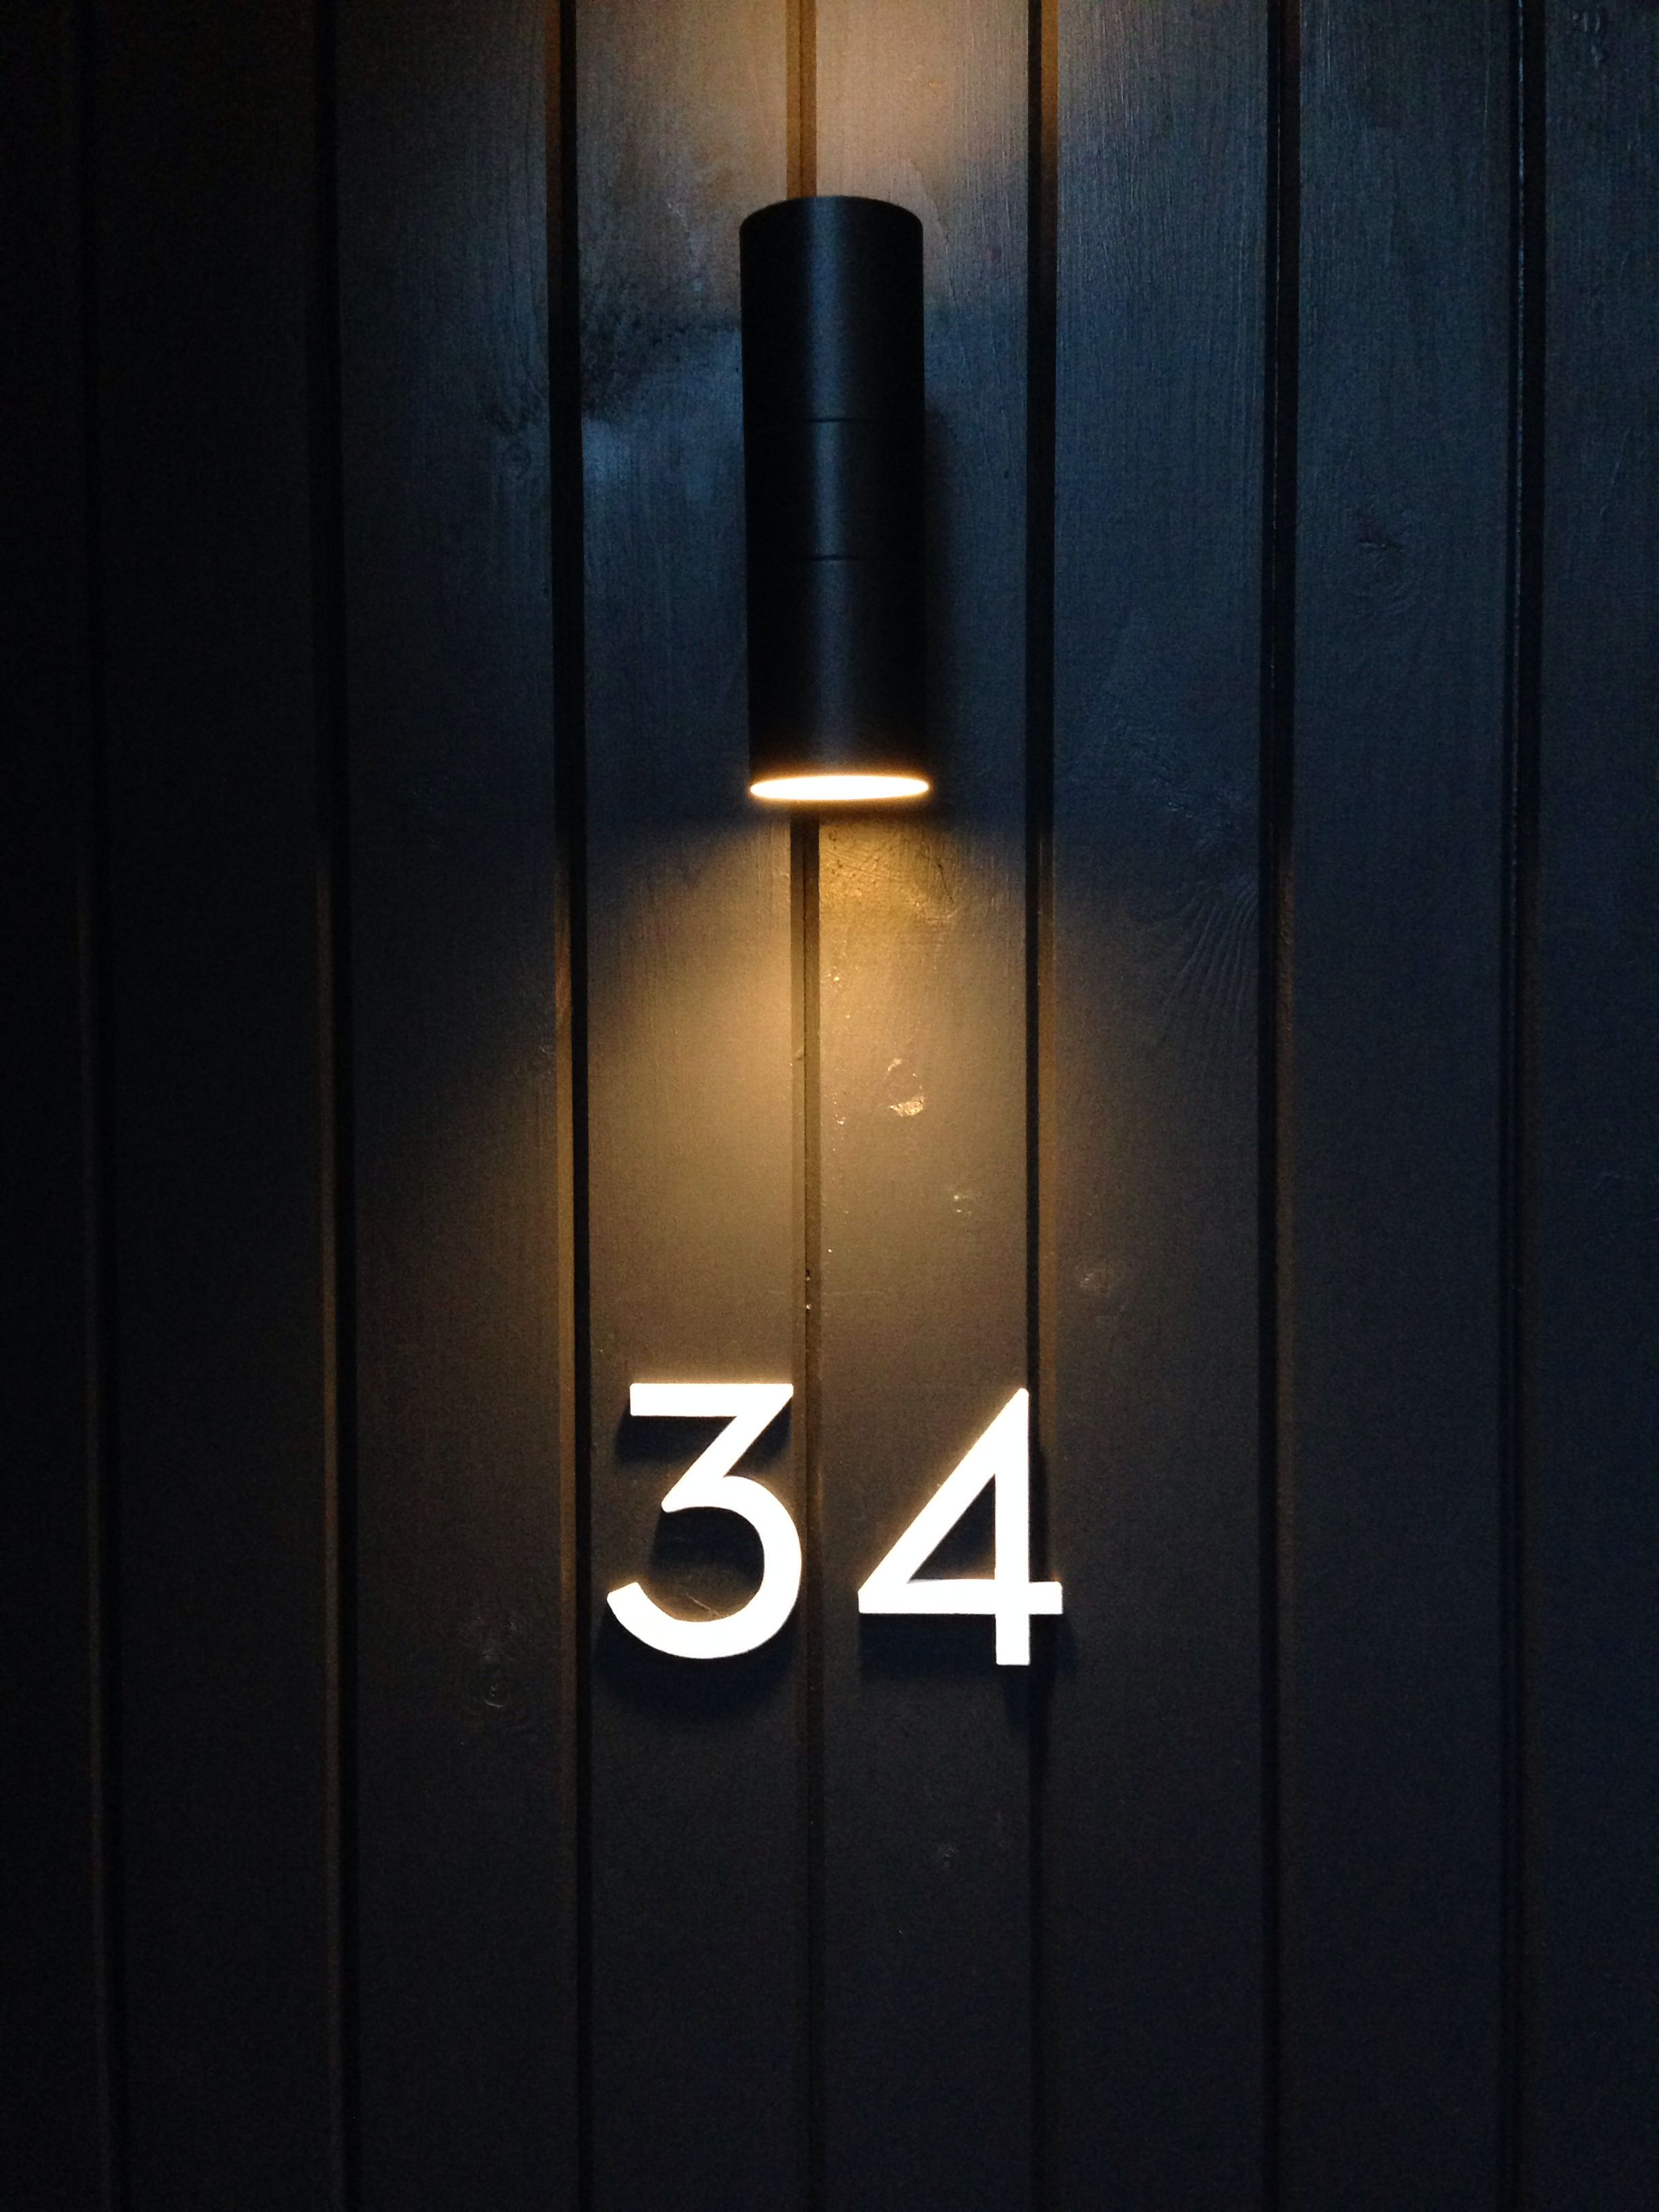 Diy Painted Neutra Door Numbers Farrow Ball No 2001 Strong